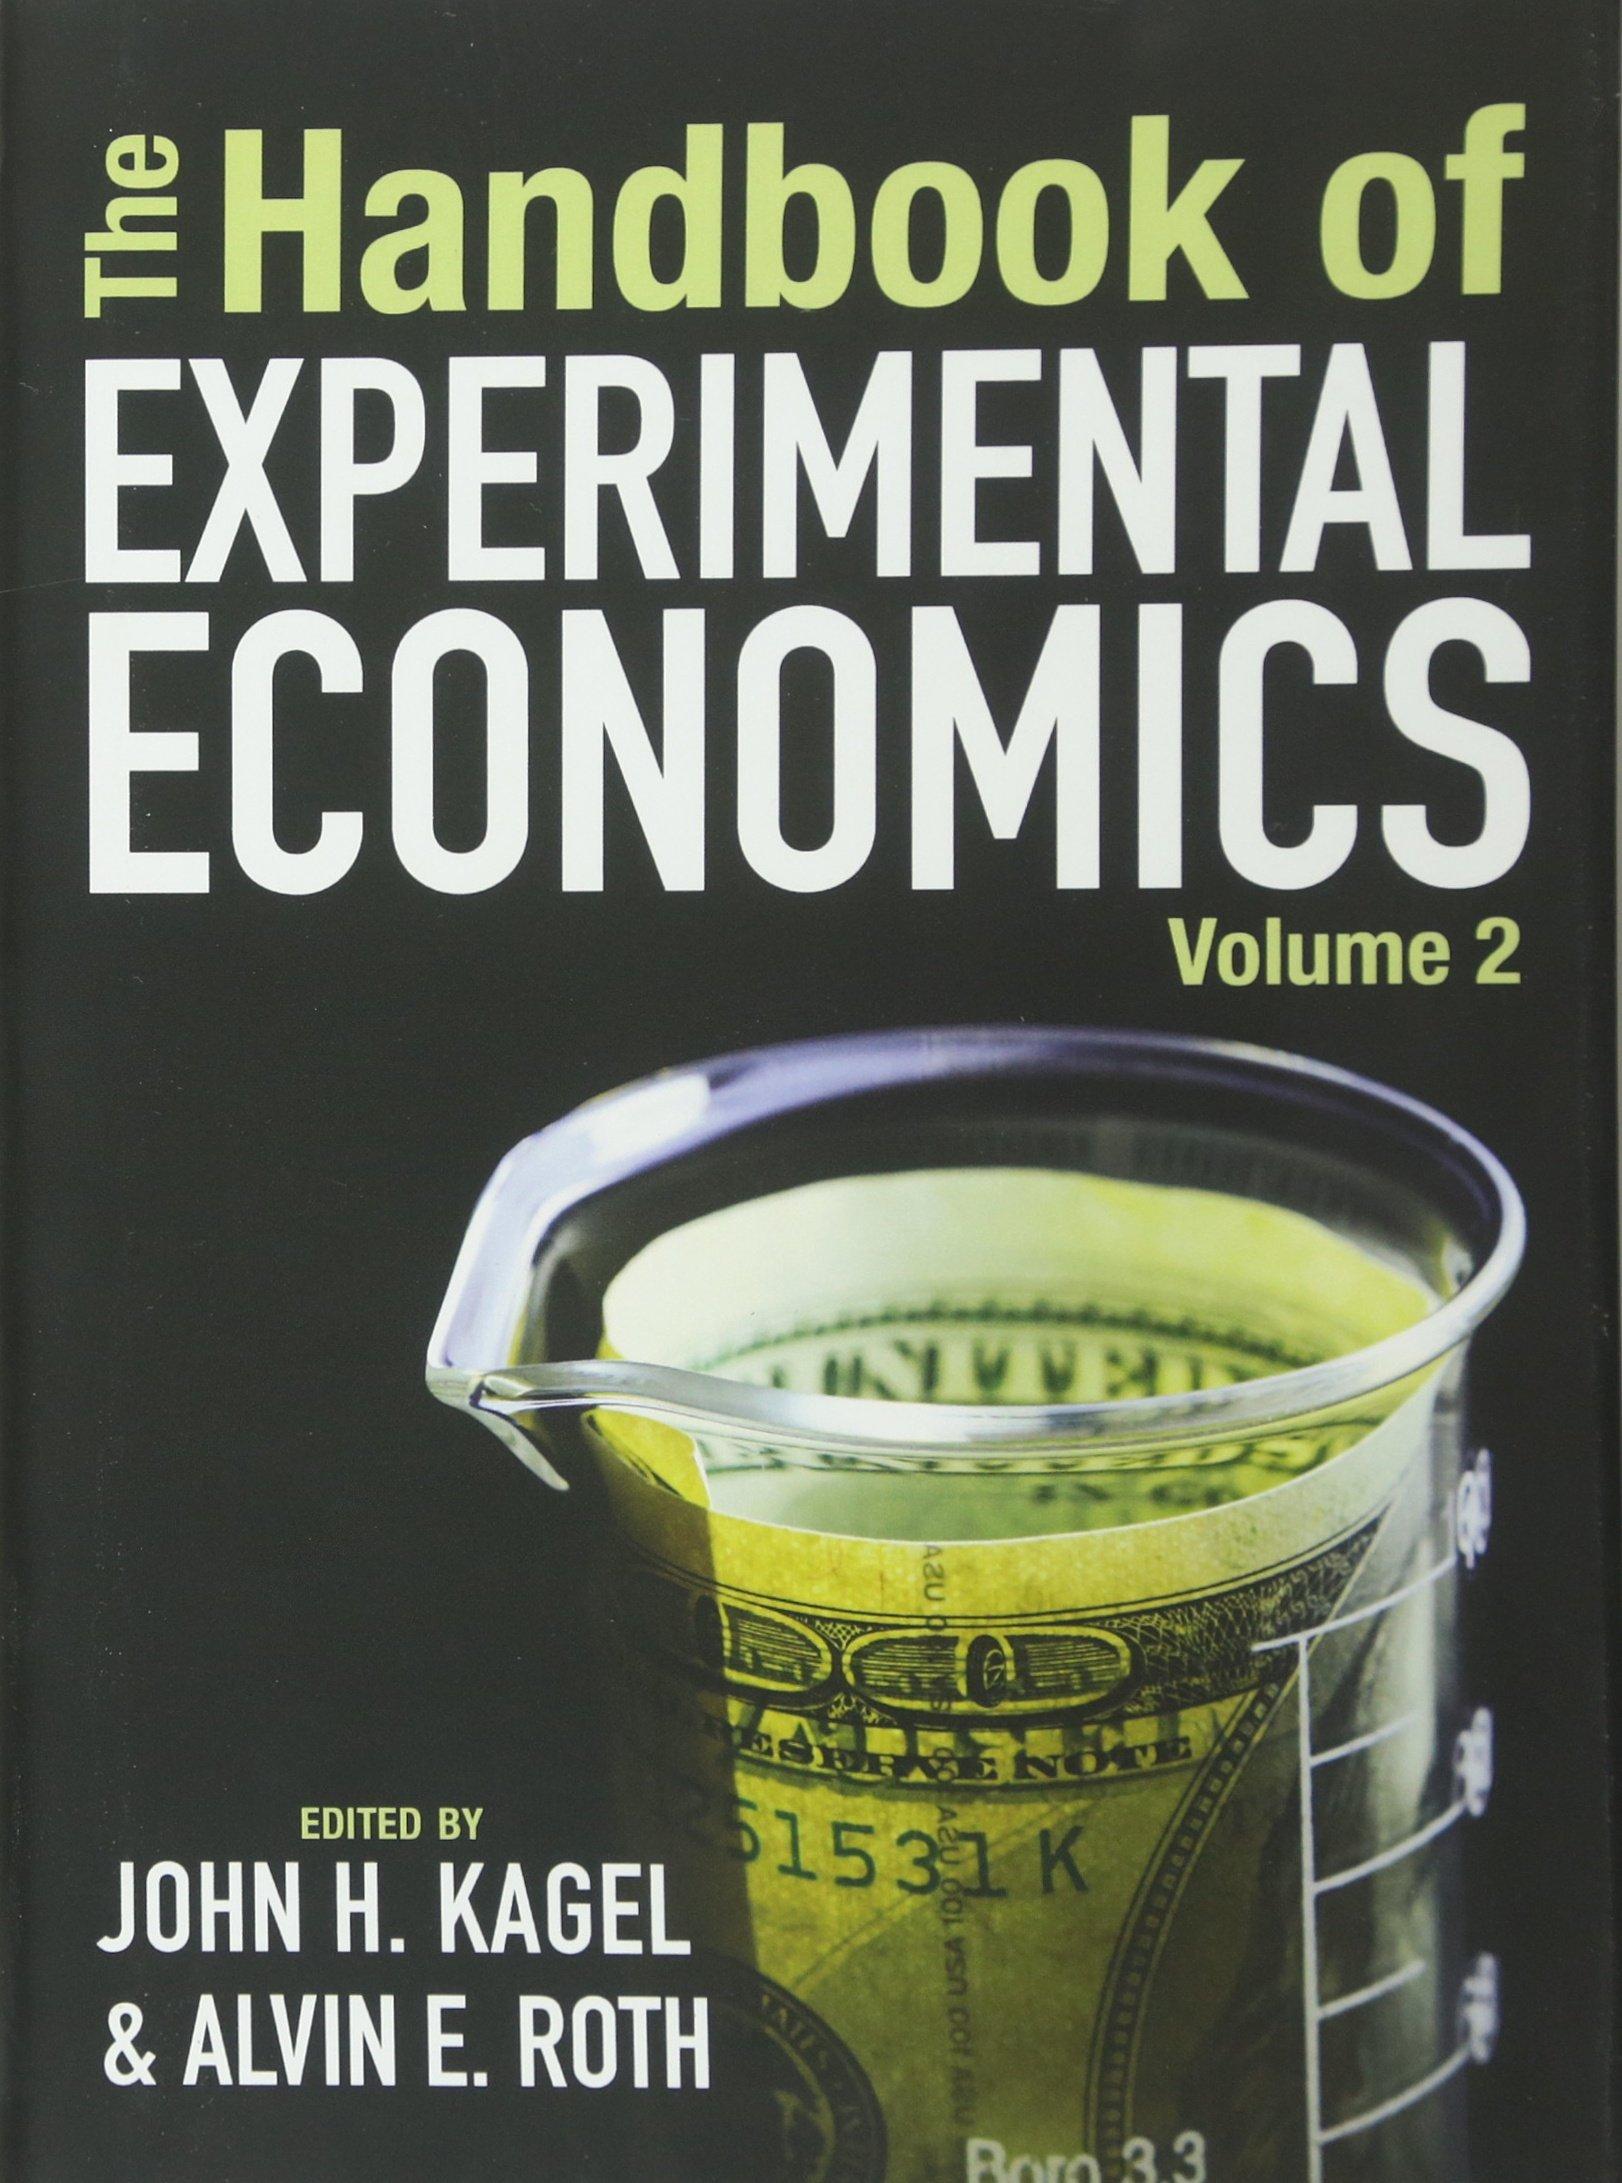 The Handbook of Experimental Economics, Volume 2 pdf